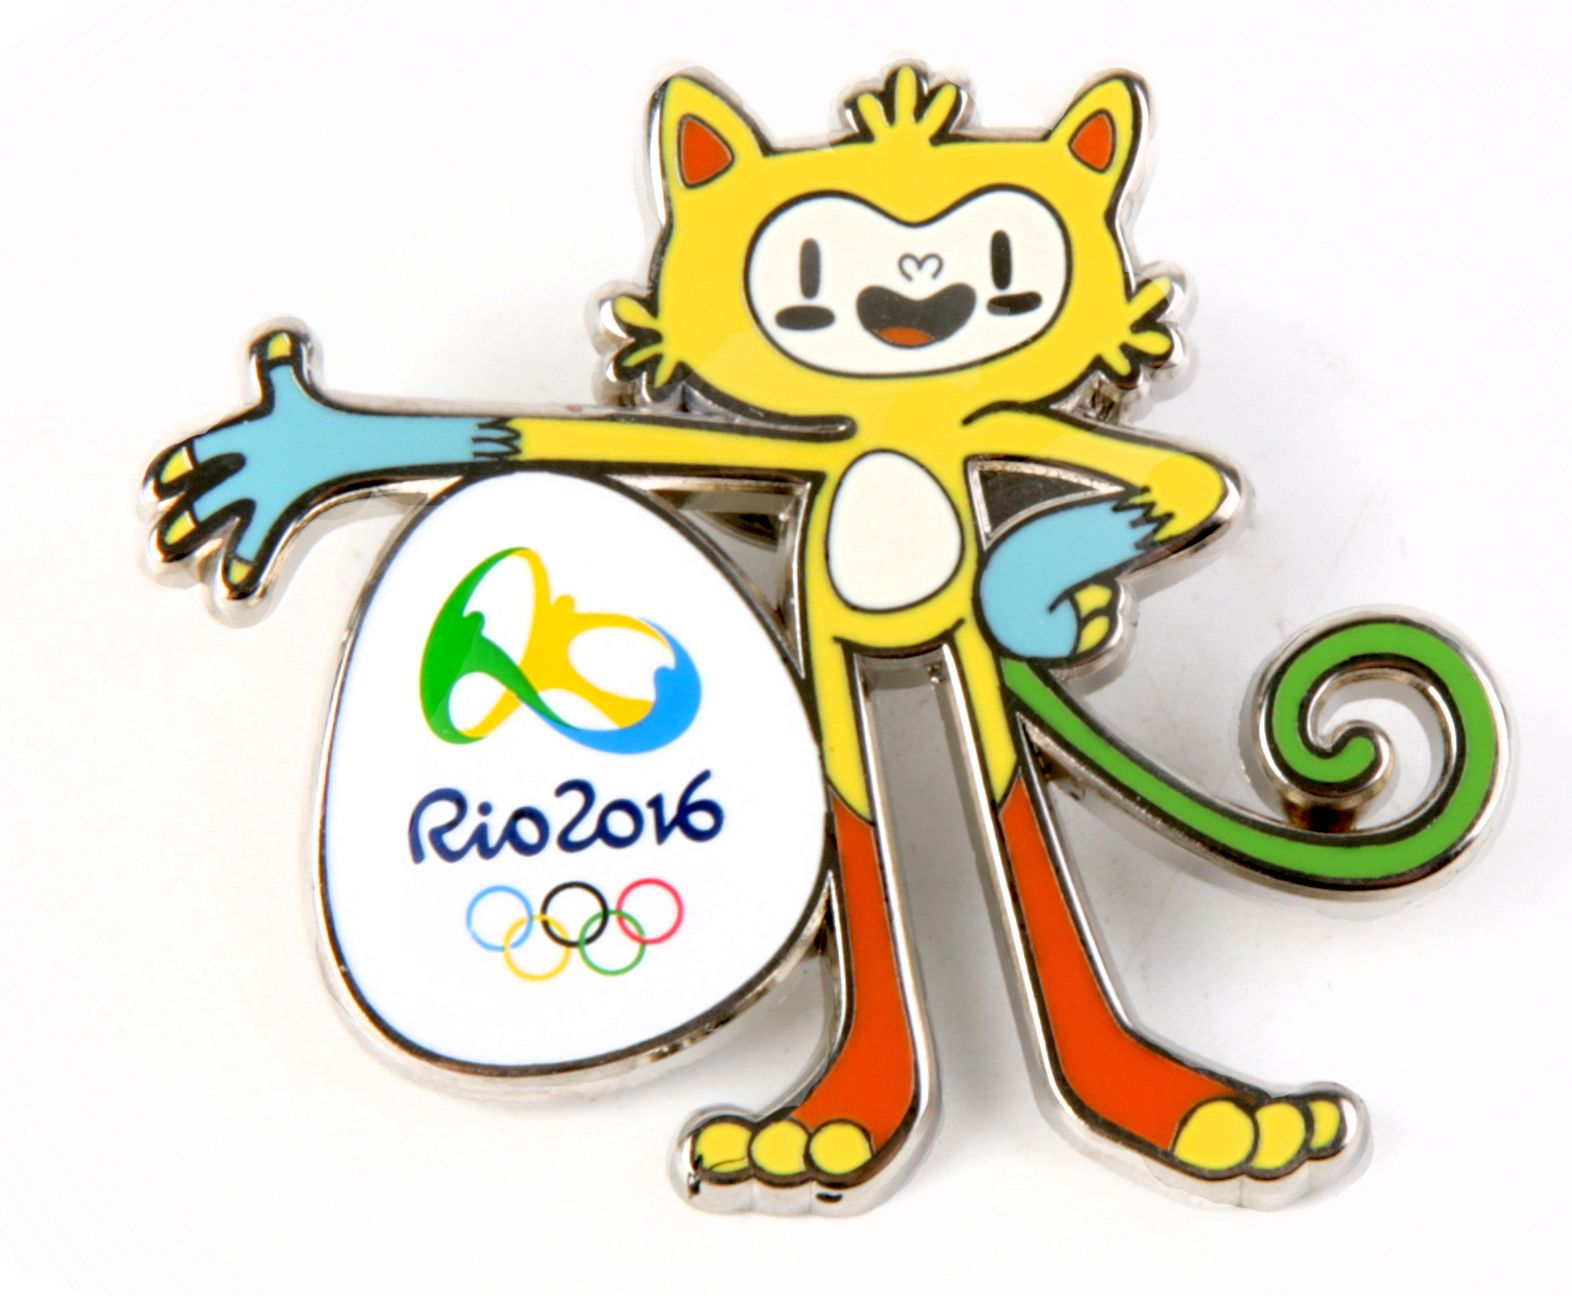 Olympic rings logo rio 2016 olympics logo designed by fred gelli - Pin Do Mascote Ol Mpico Rio2016 Vinicius